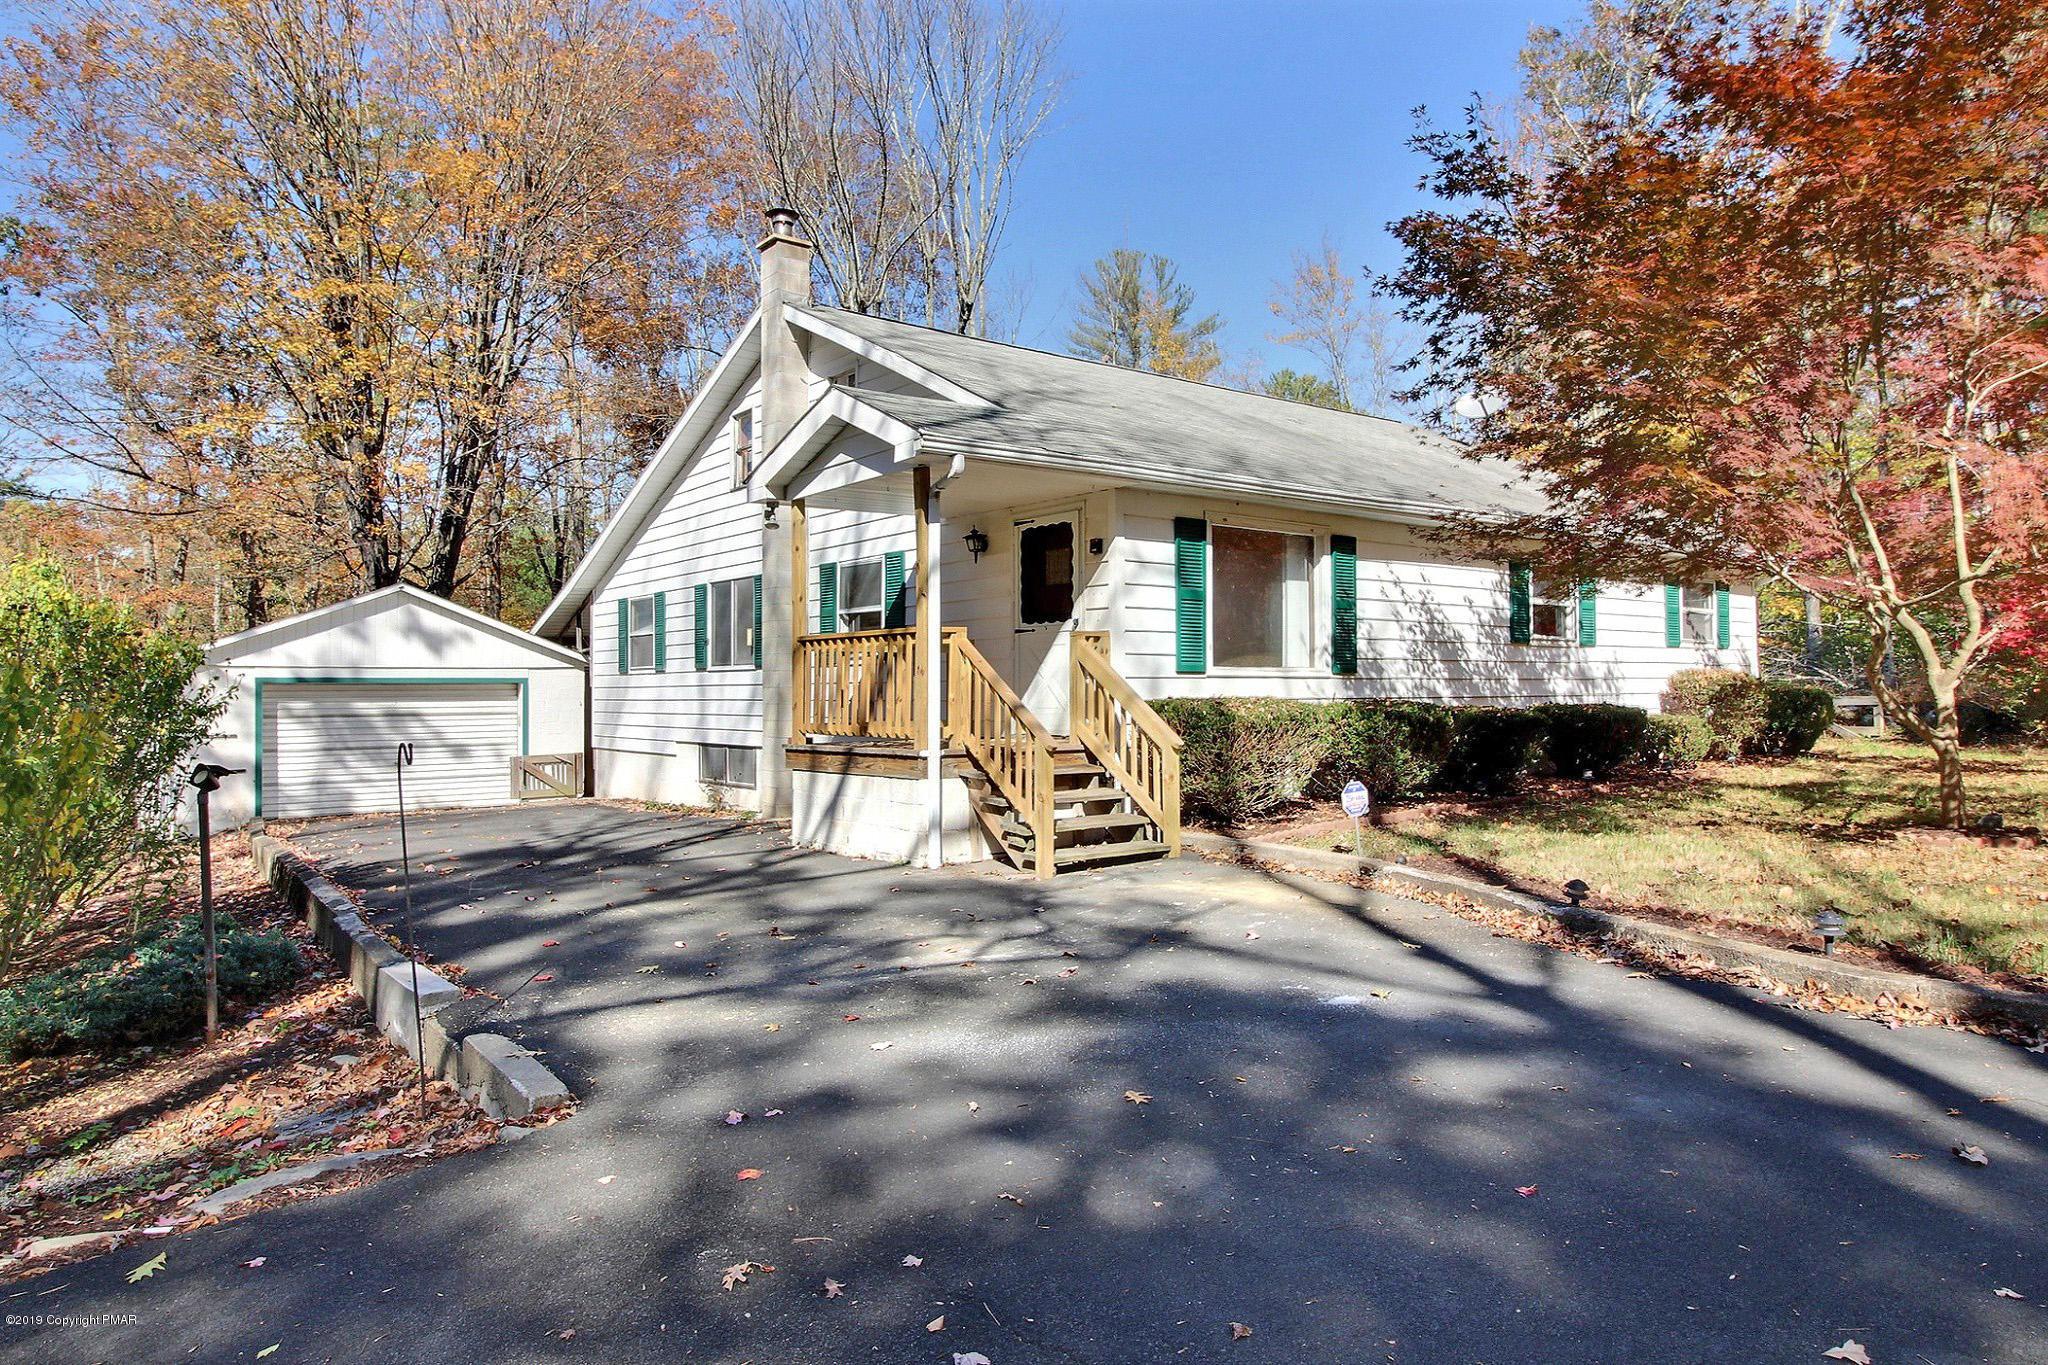 475 Resica Falls Rd, East Stroudsburg, PA 18302